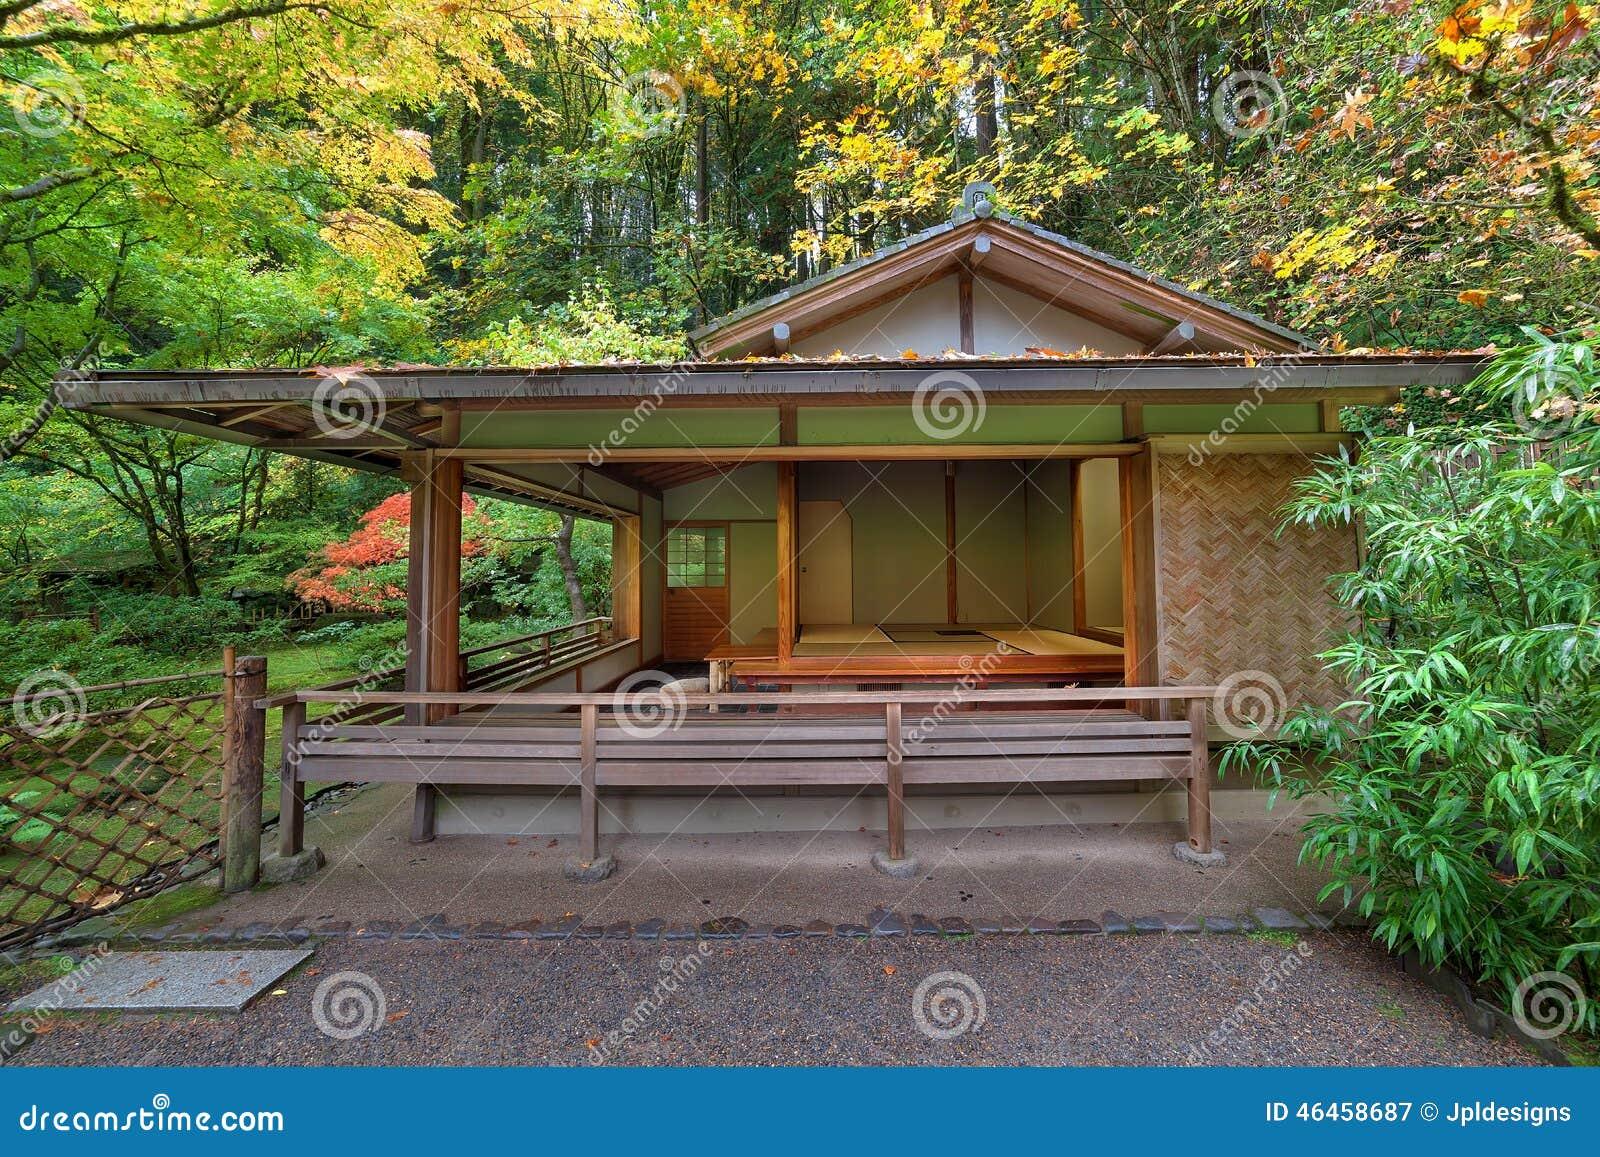 Tea House At Japanese Garden In Fall Seaston Stock Image - Image of ...